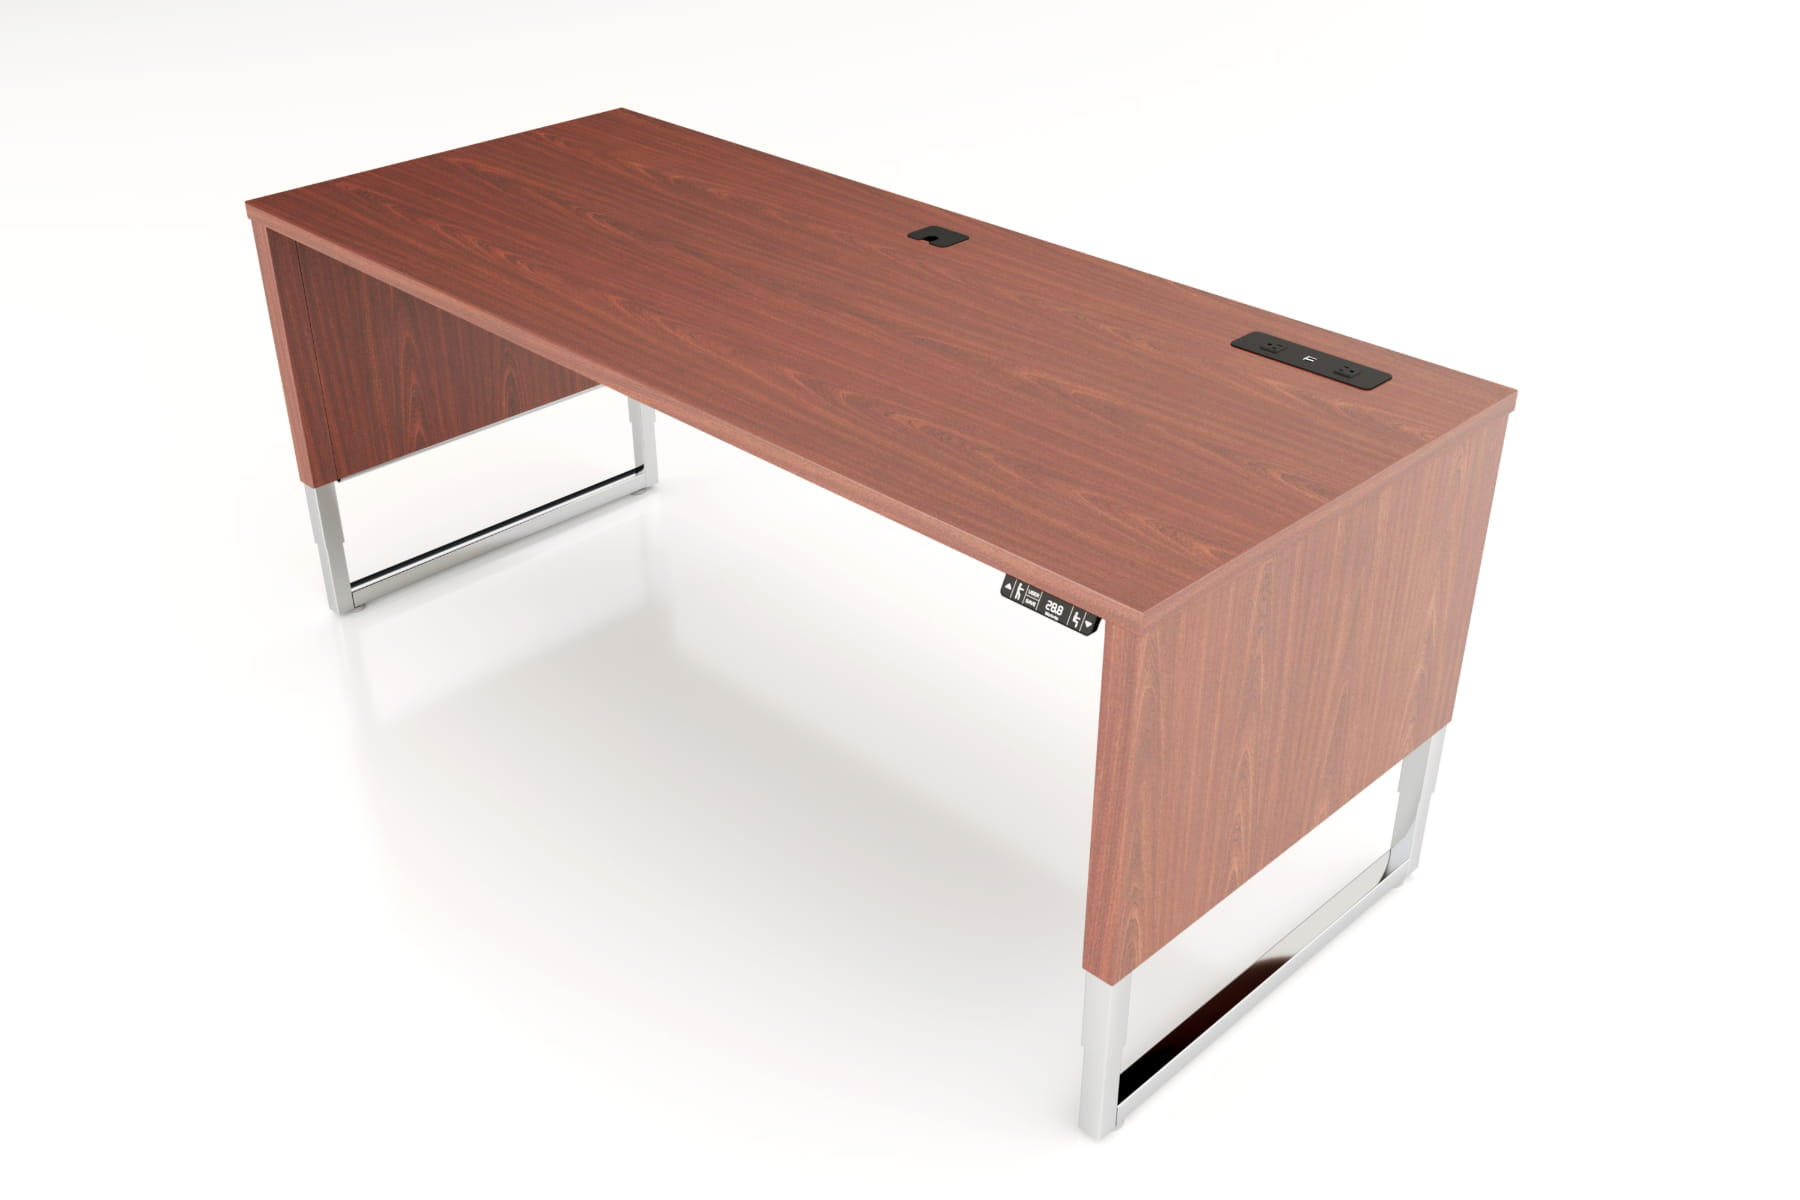 Advent-Desk-ADV-7230-MH-Mid-Front